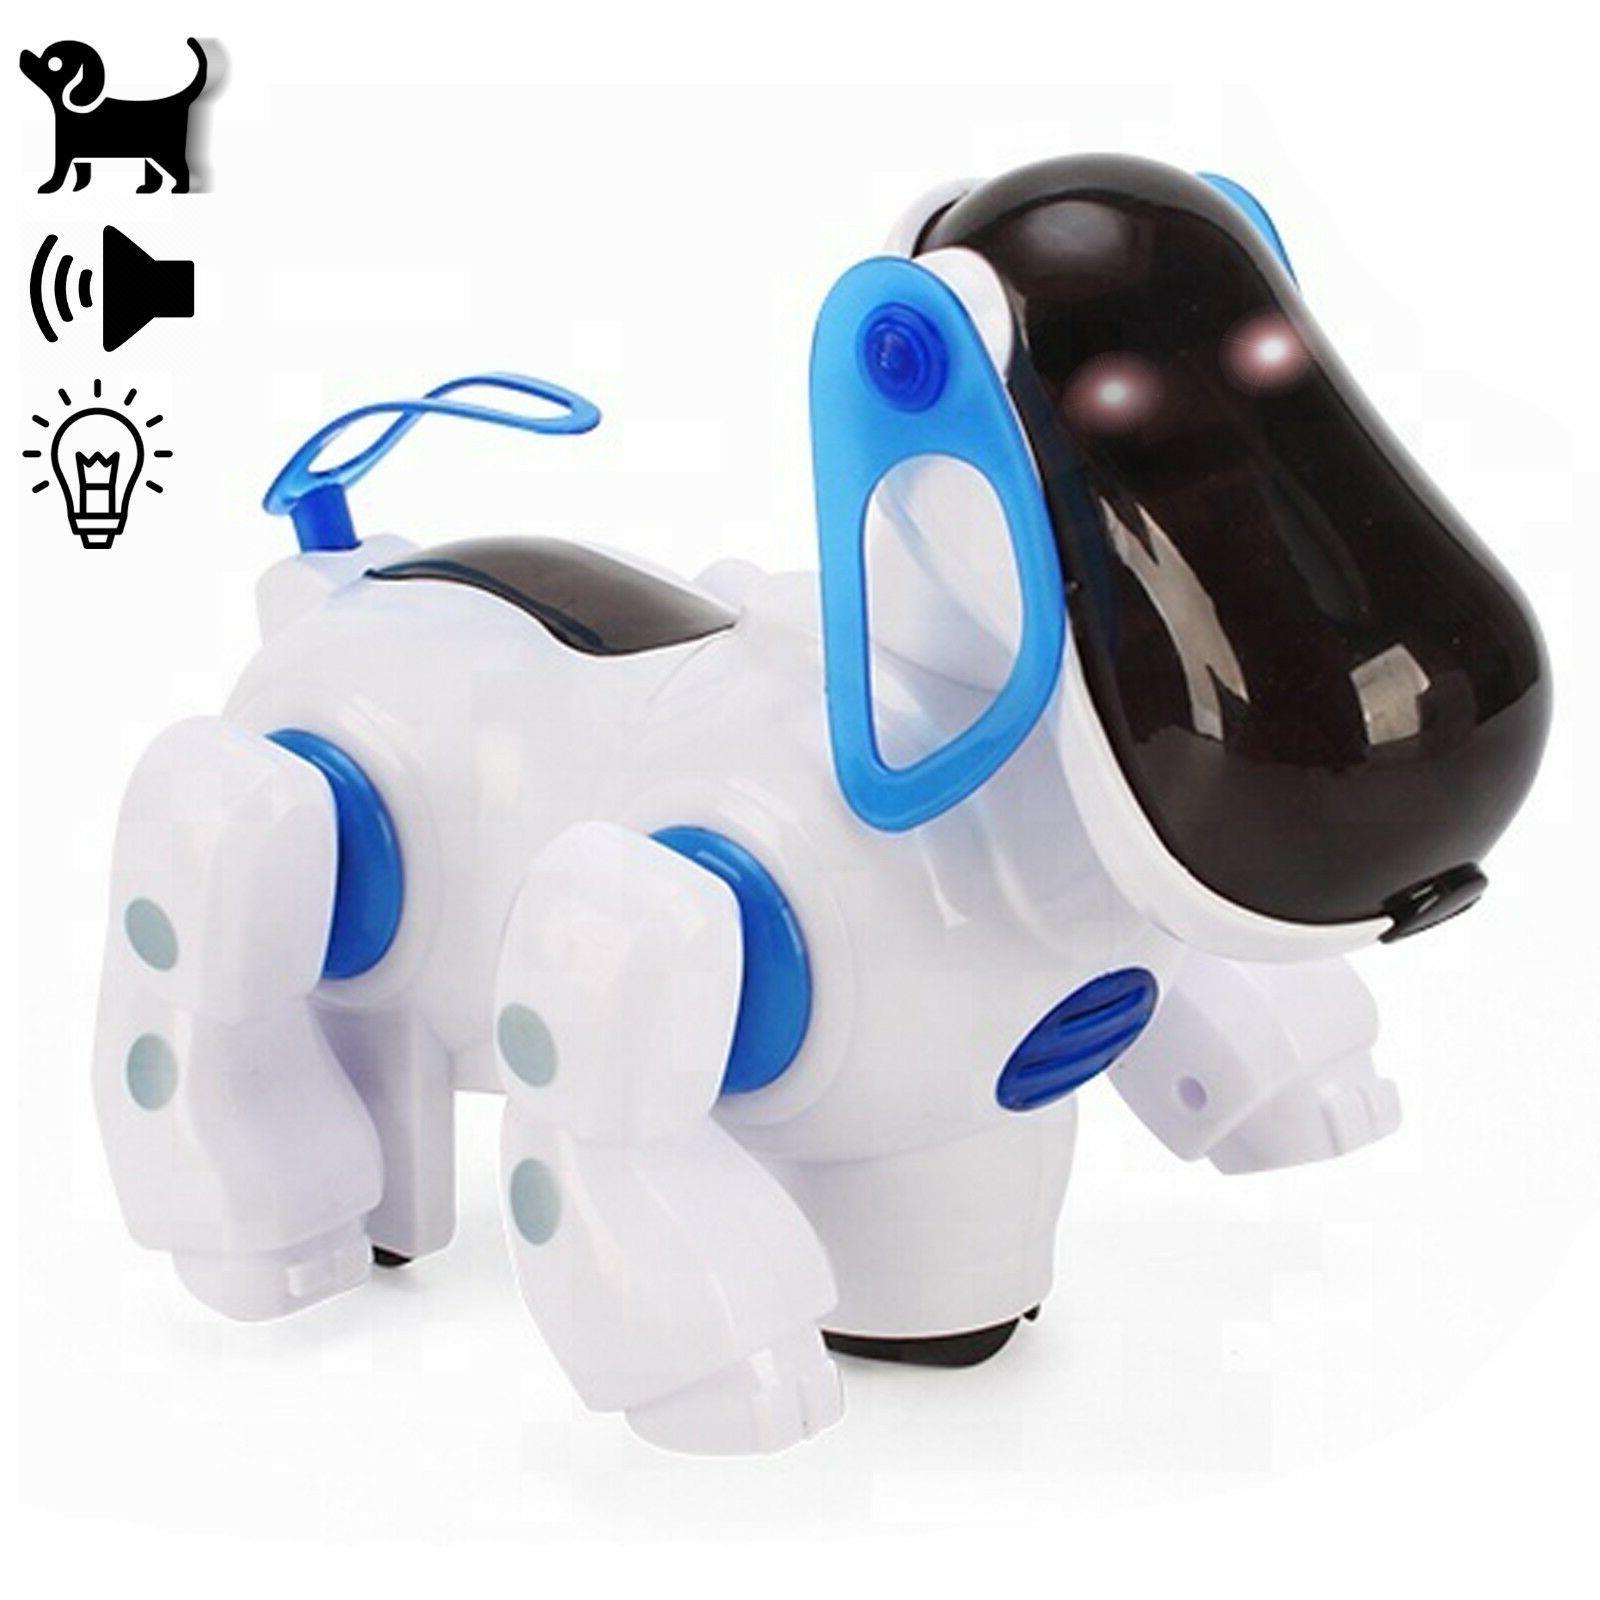 robot dancing dog bump and go electronic